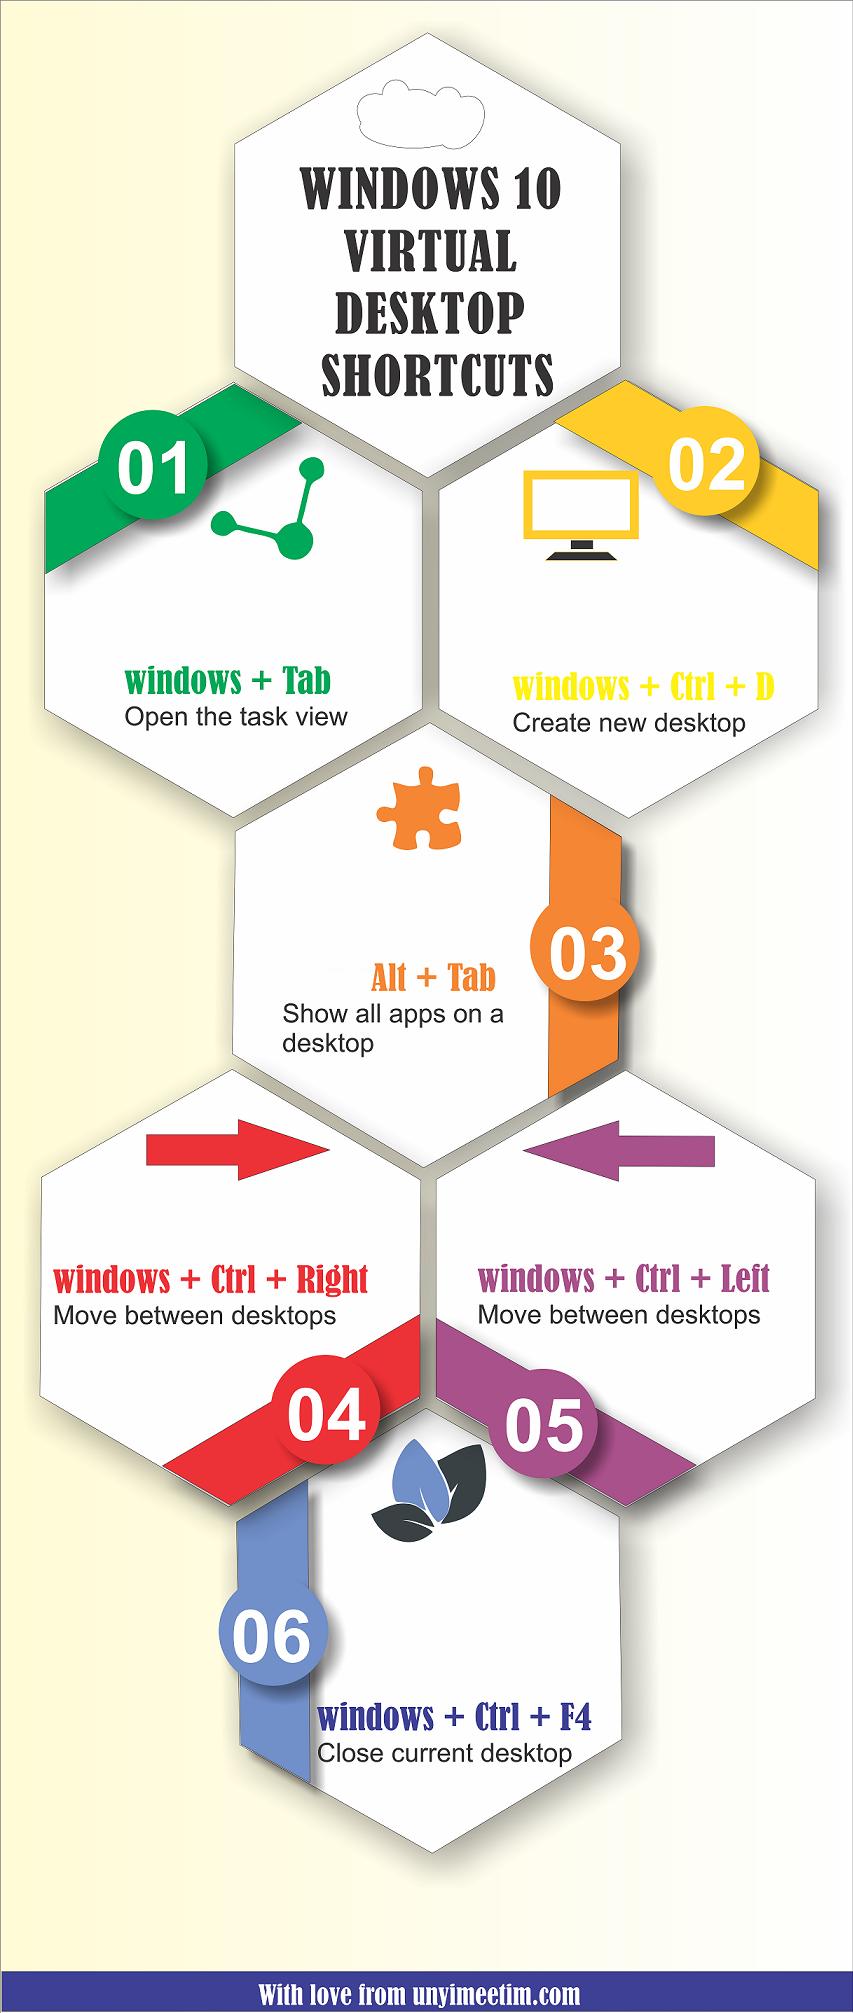 Windows 10 virtual desktop shortcuts